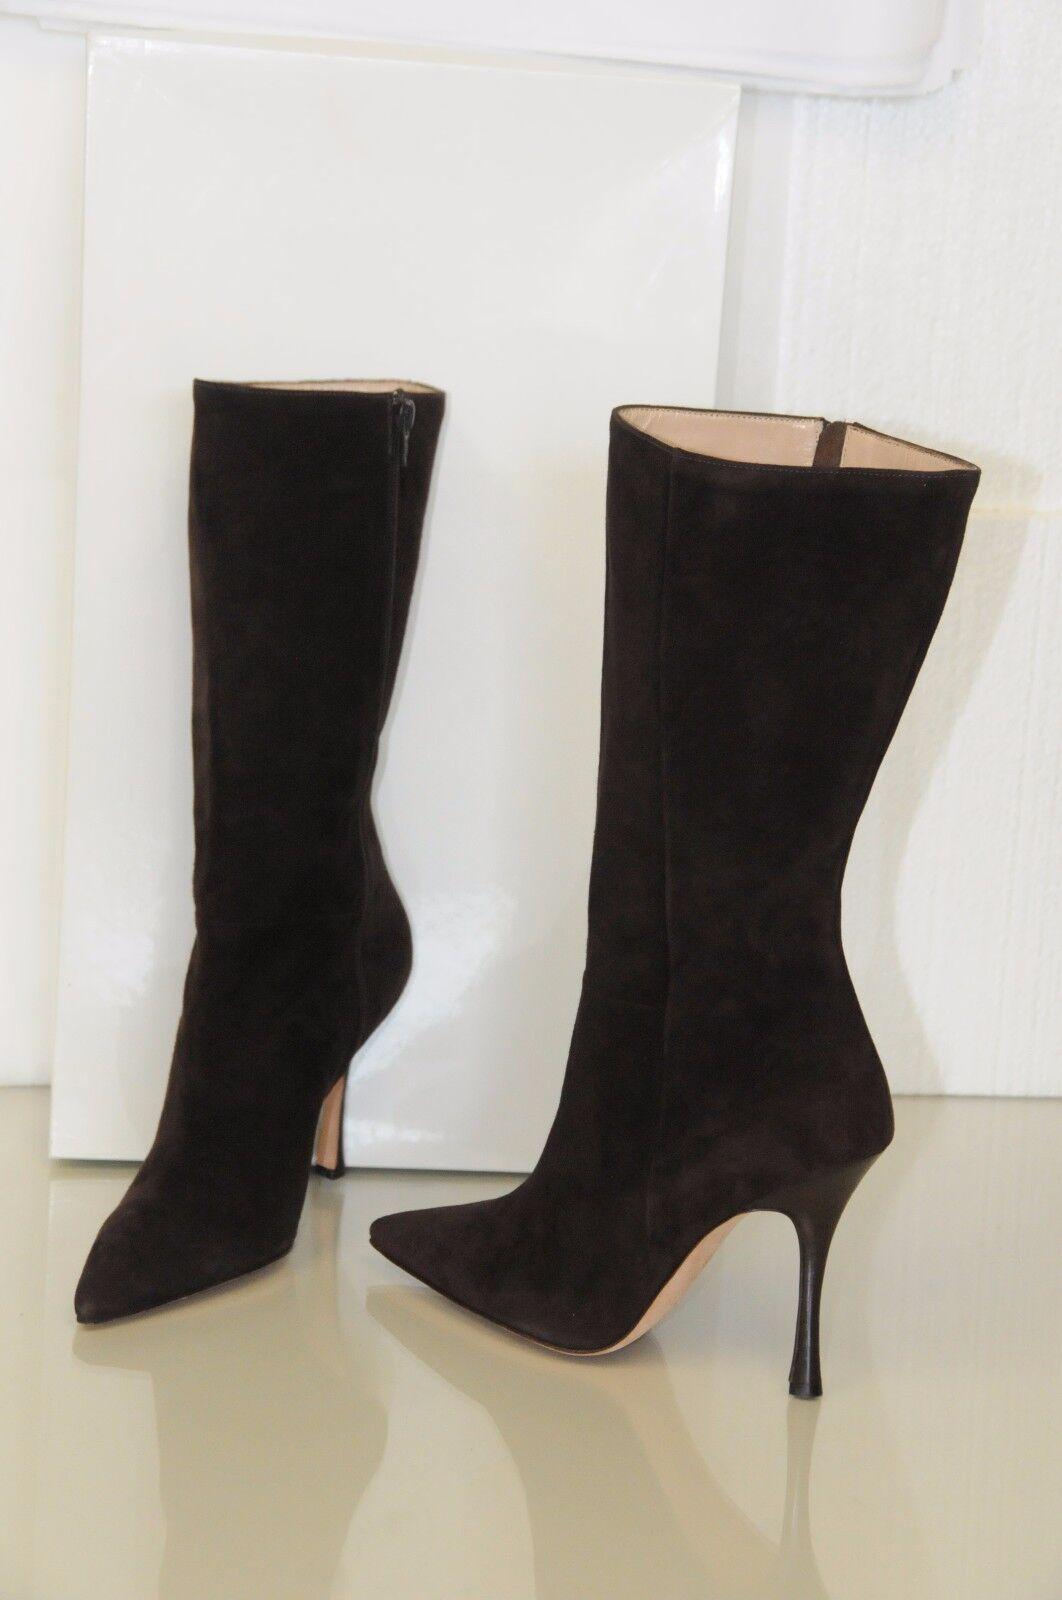 $1395 New MANOLO BLAHNIK GATTI GATTI BLAHNIK Chocolate Braun SOFTEST Suede BB Stiefel SHOES 39 2bfa11